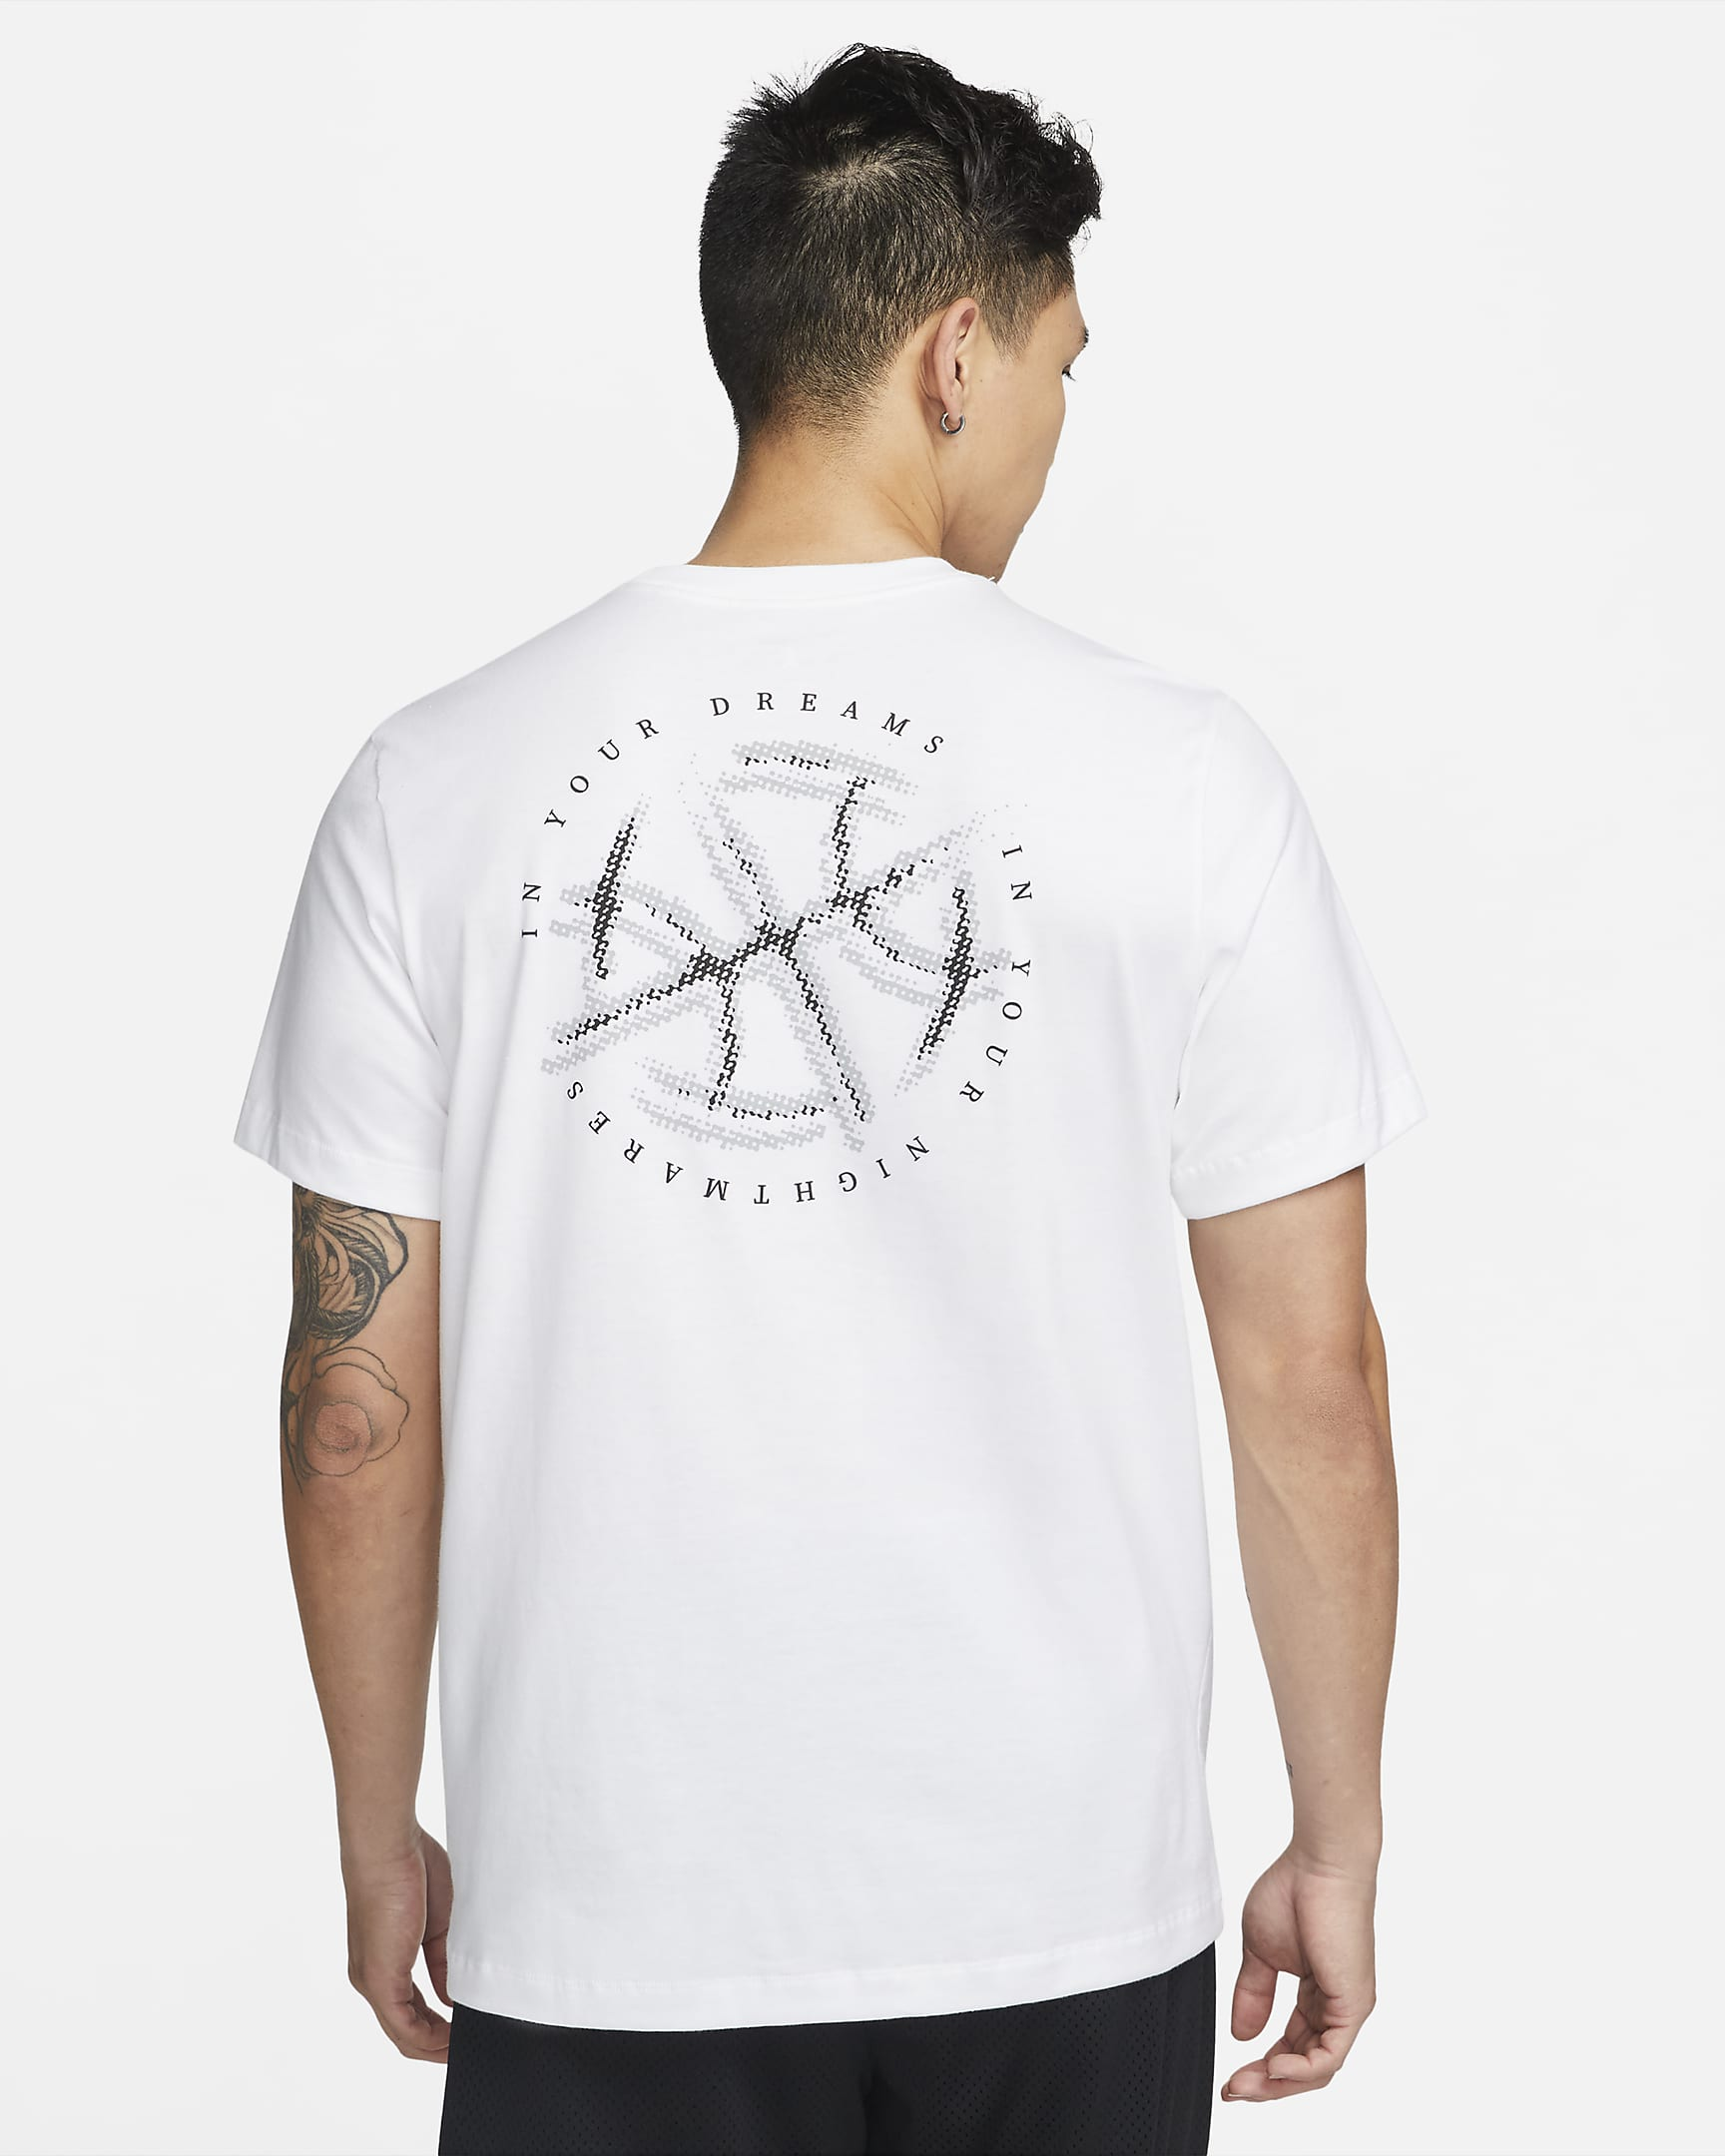 jordan-sport-dna-mens-short-sleeve-t-shirt-5dQJlz-1.png